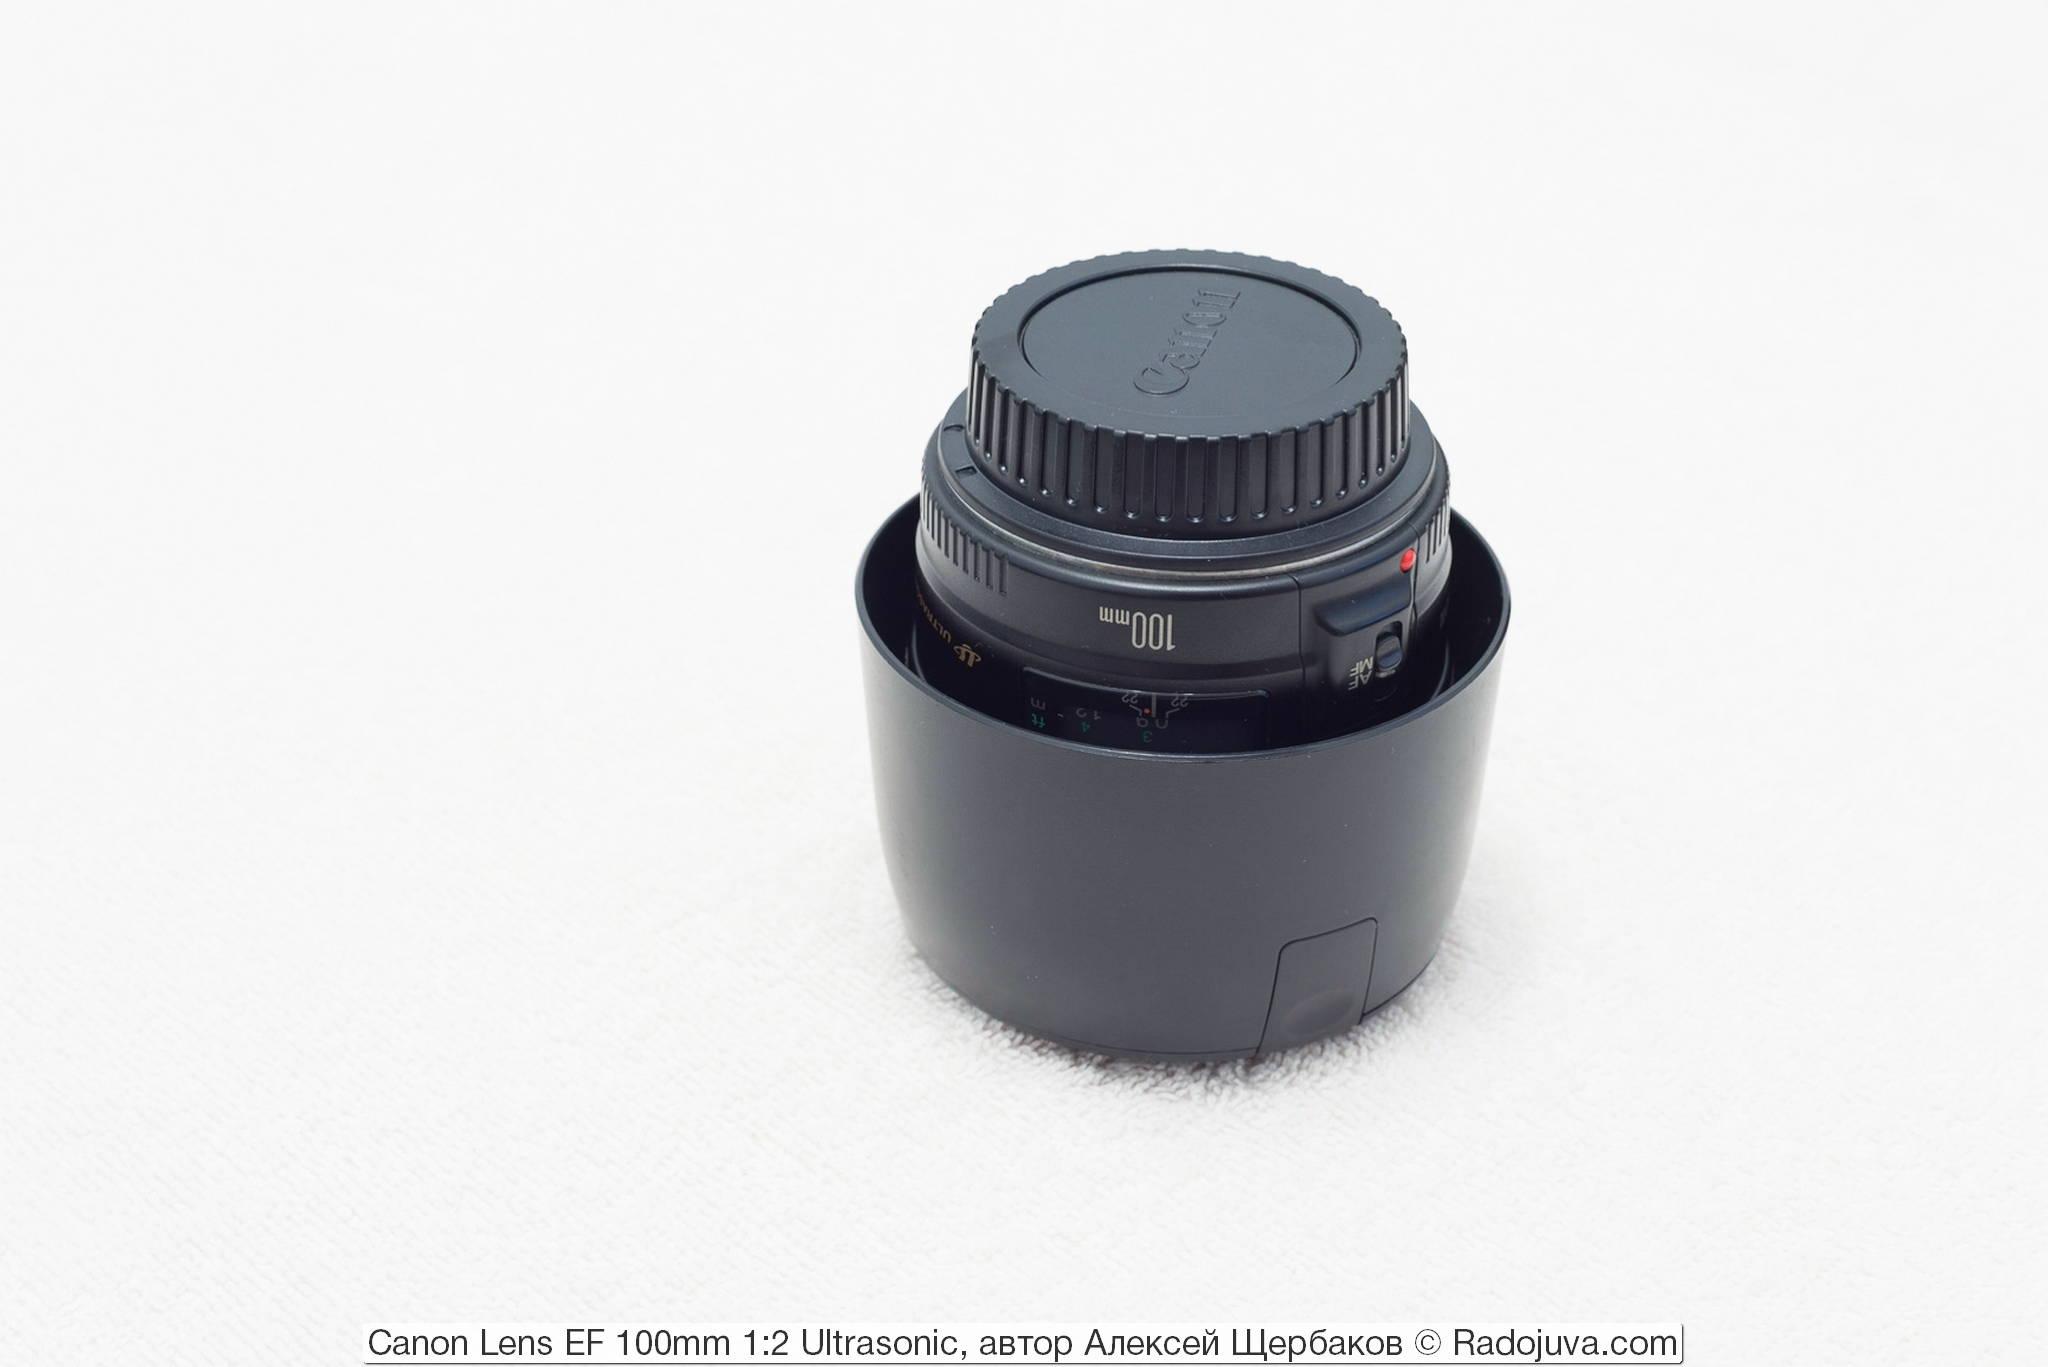 Canon Lens EF 100mm 1:2 Ultrasonic